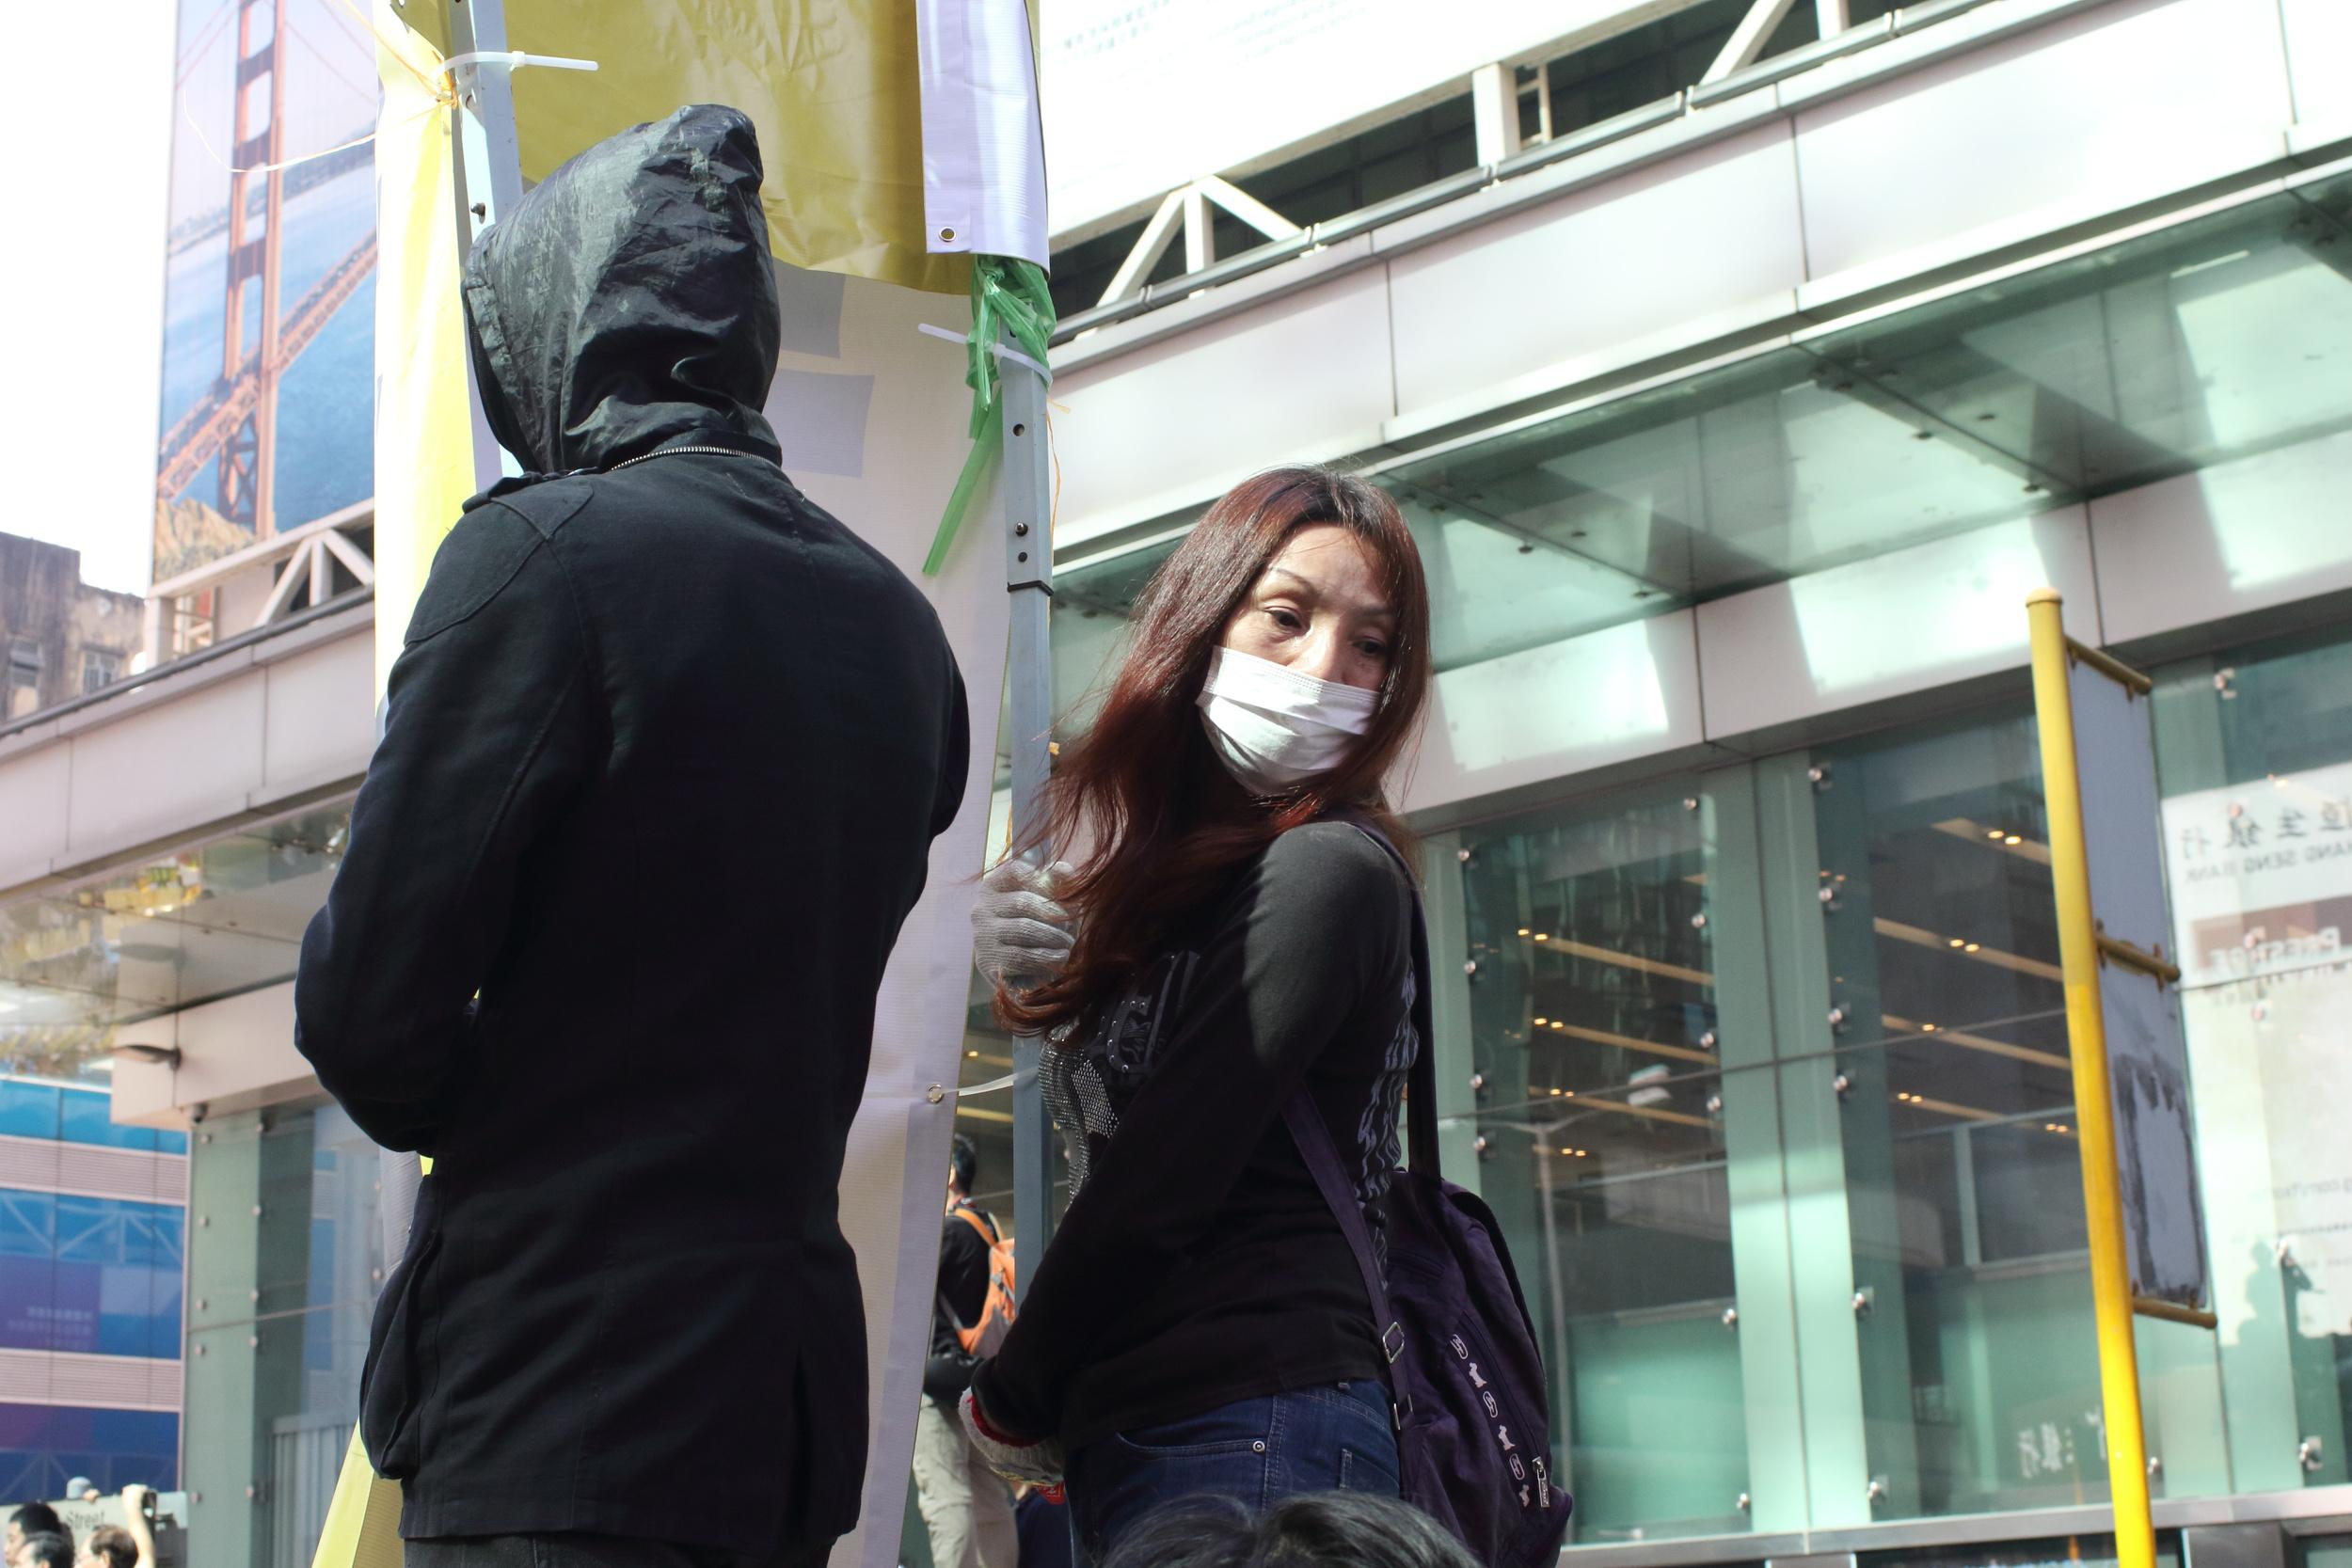 jfung1 Mongkok Argyle Clearance8.JPG